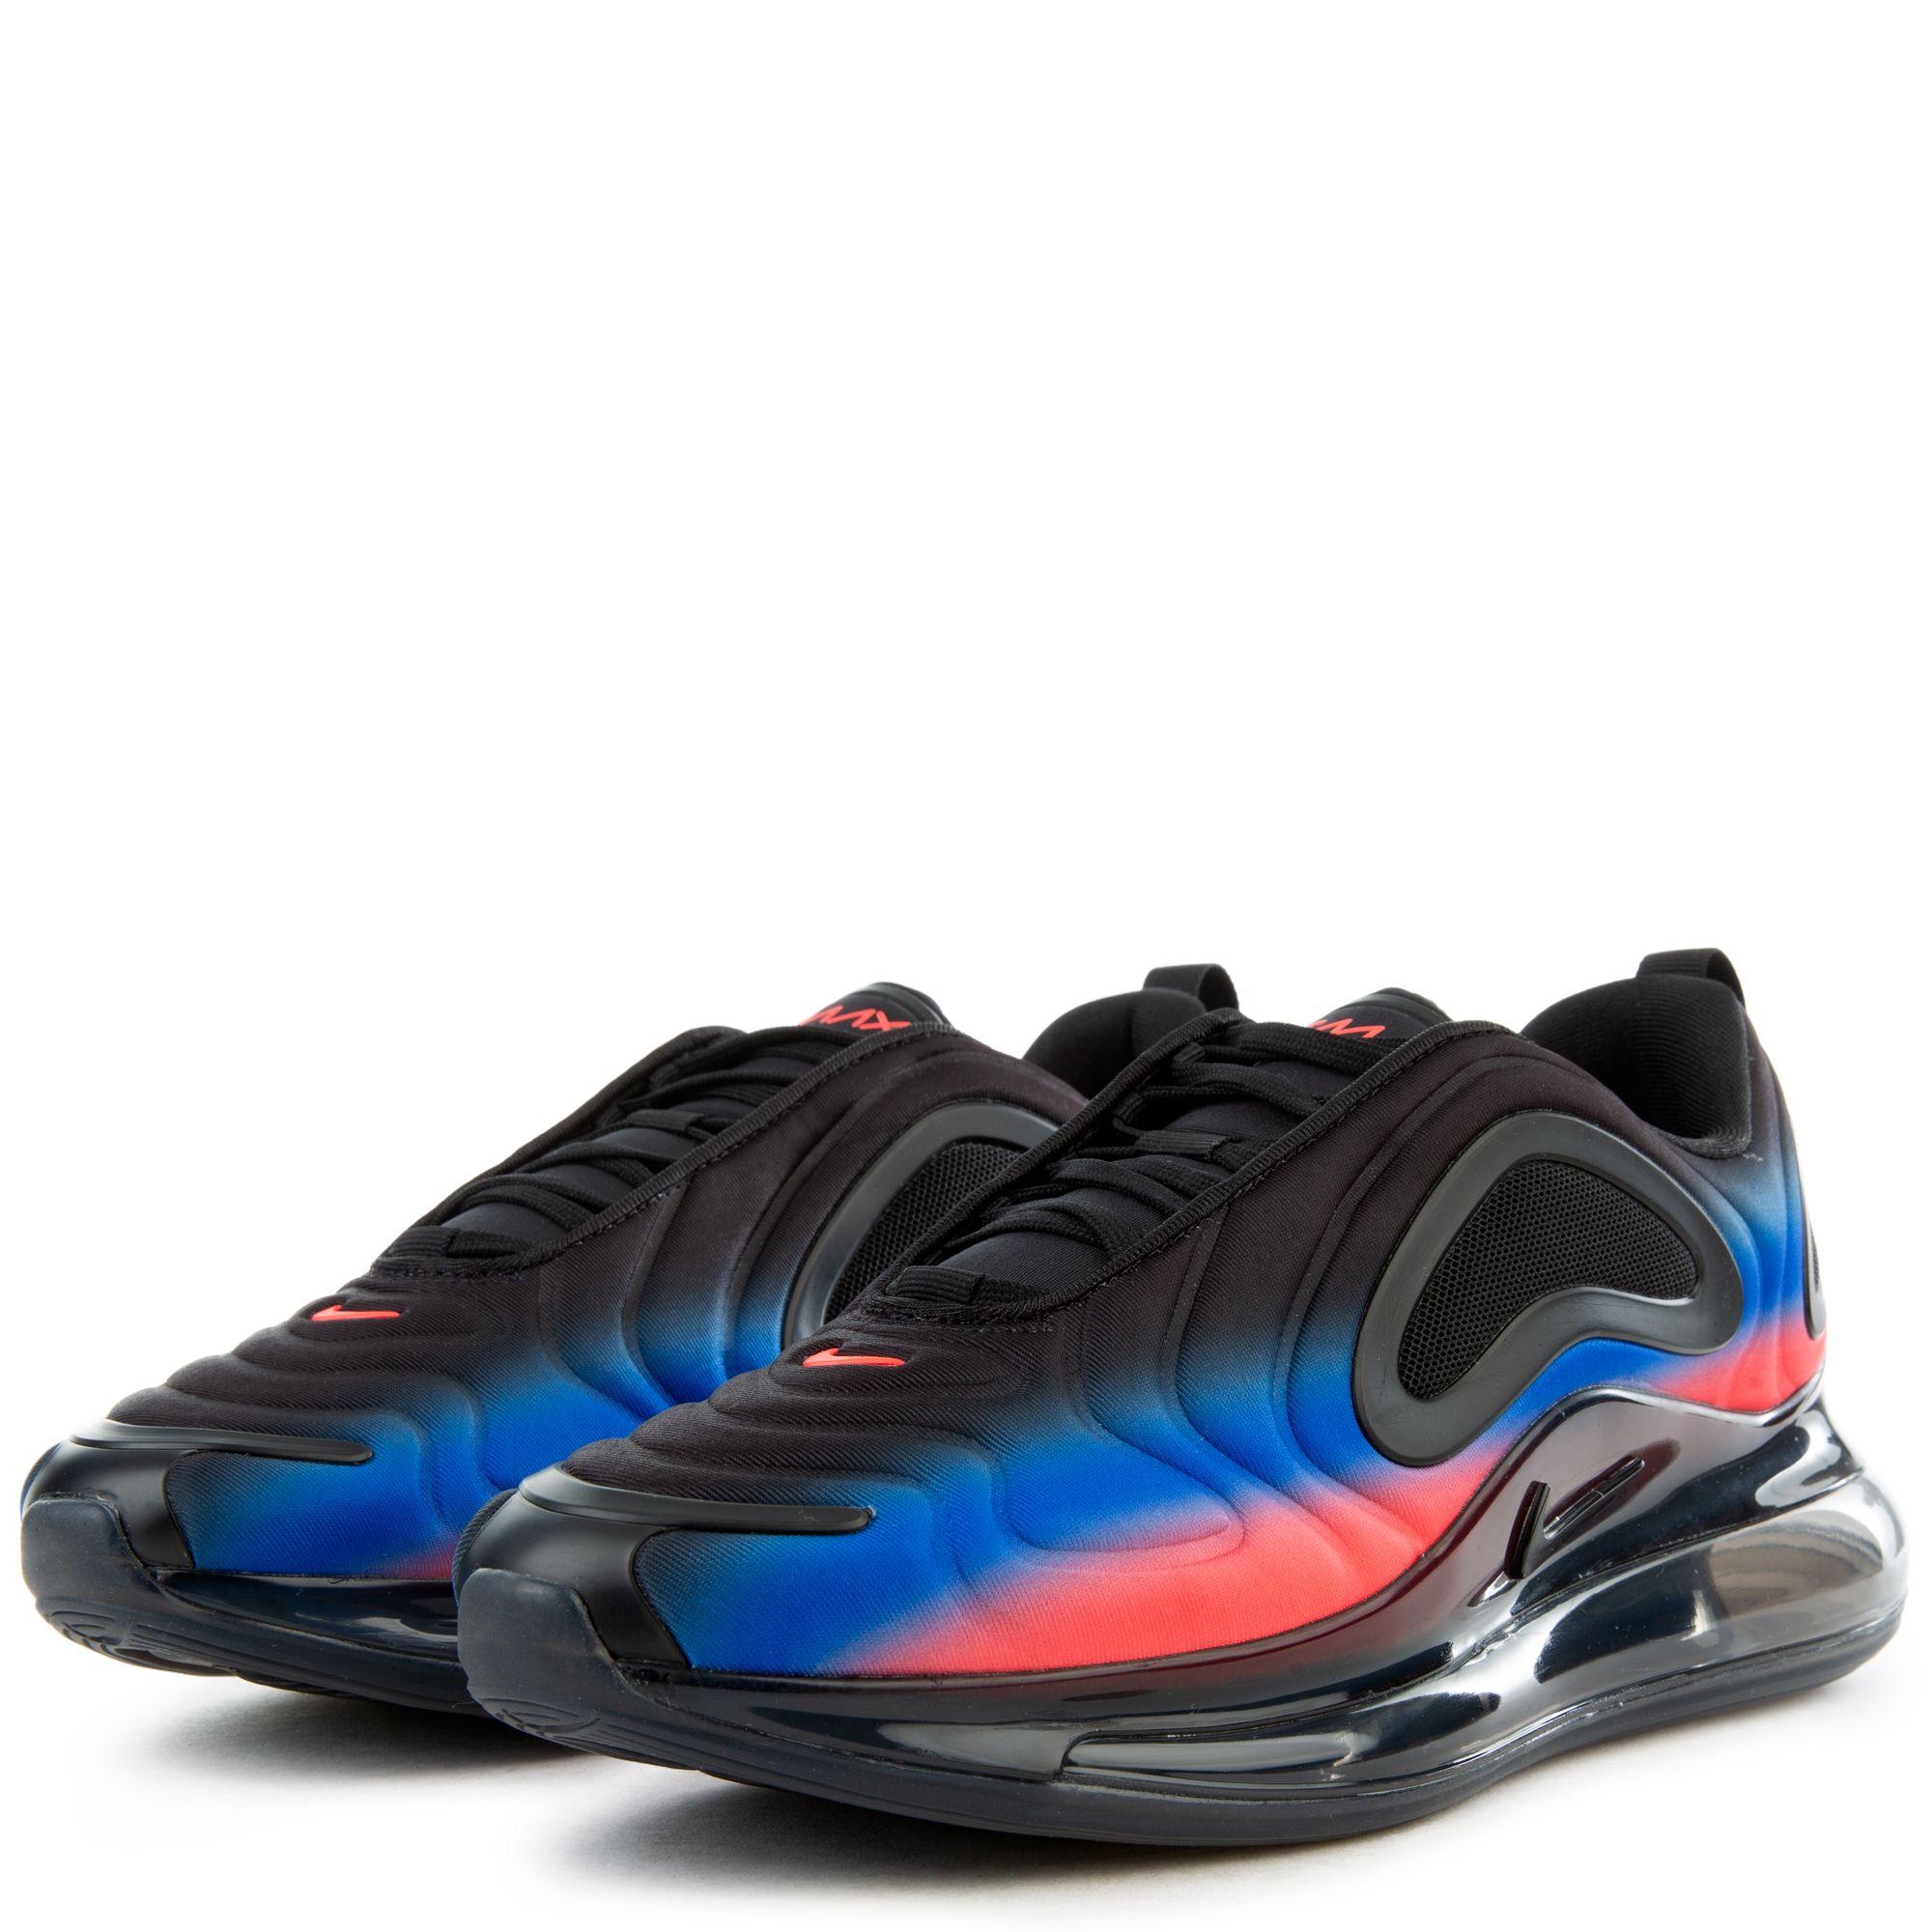 air max 720 black and blue